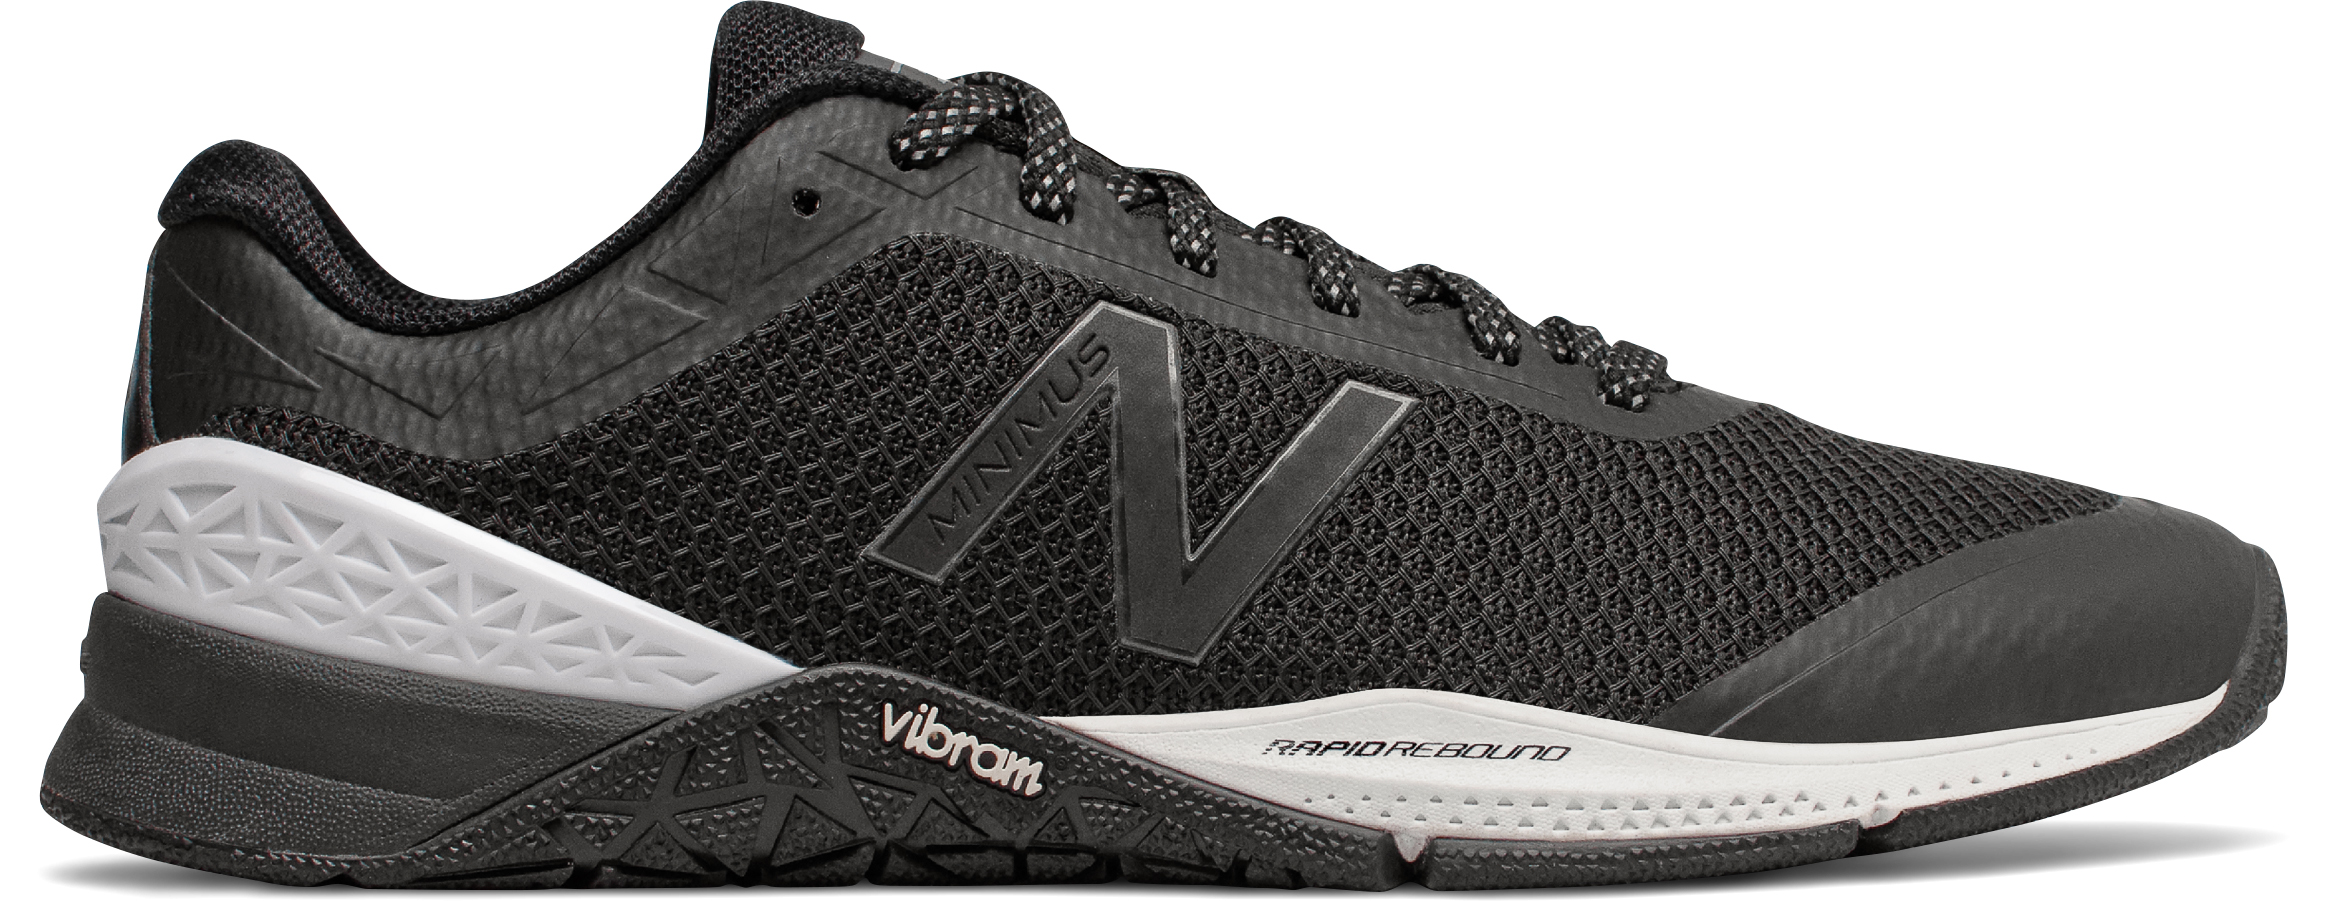 check out 444d3 f8a9e New Balance Shoes   MEC